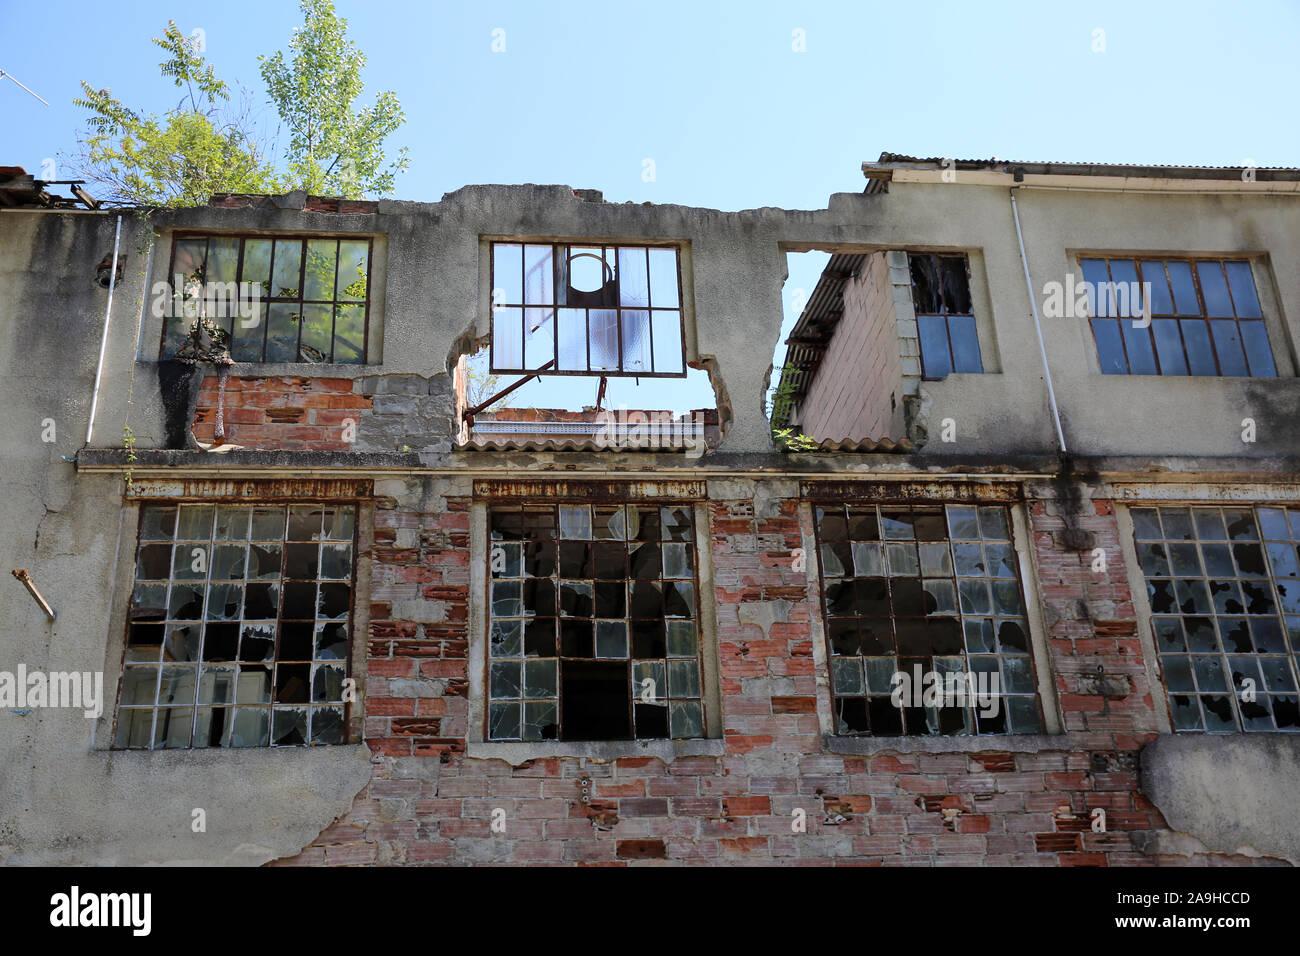 Derelict Building, La Sône, La Rhone-Vercors, France Stock Photo